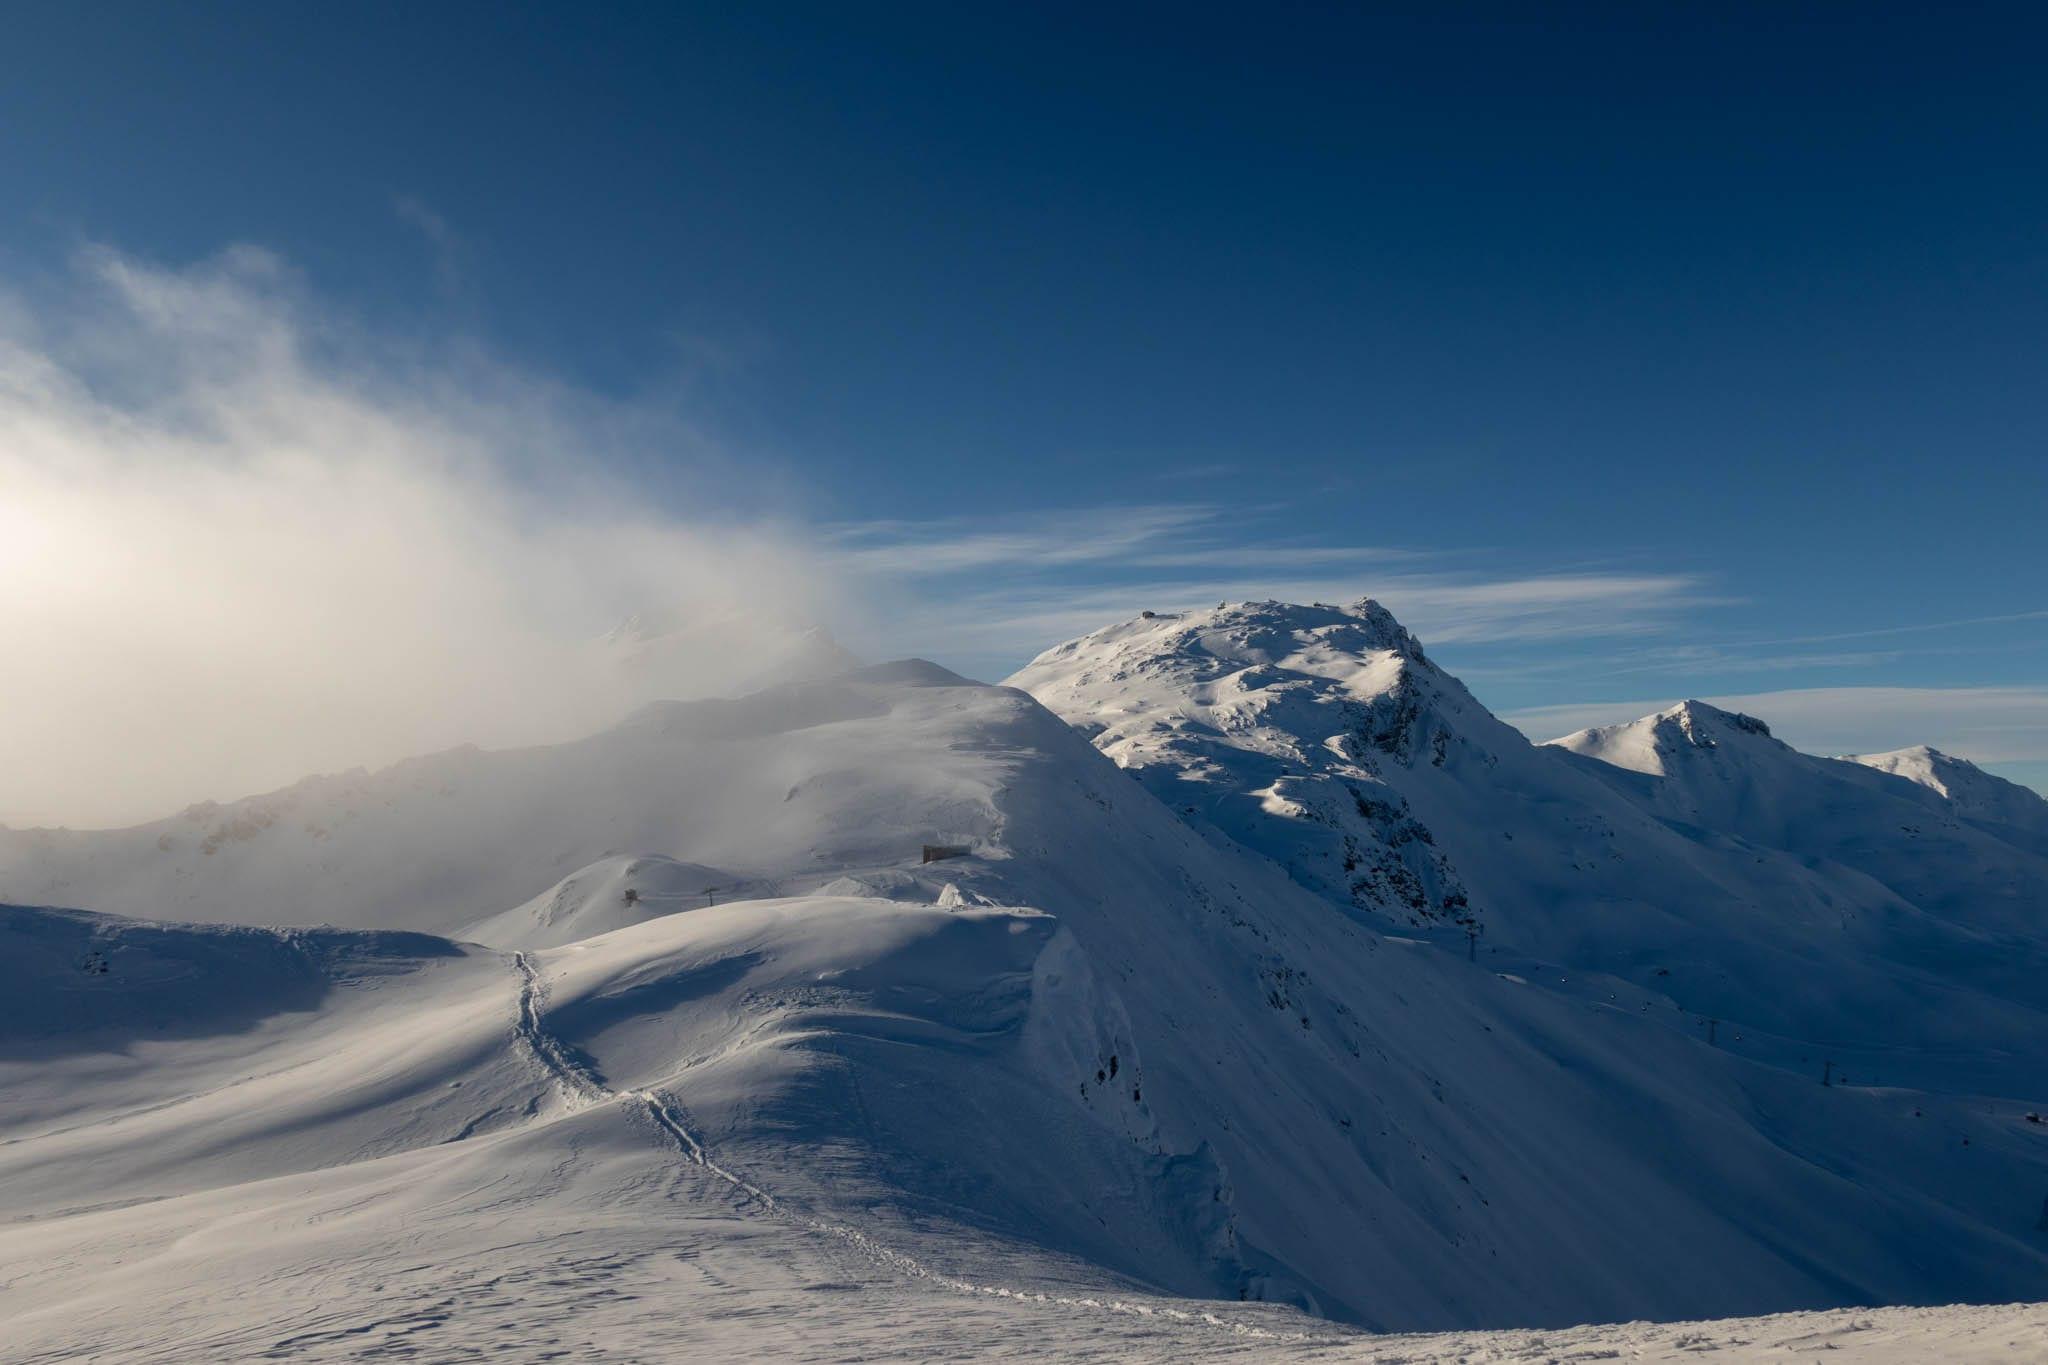 Klosters Jan 2019